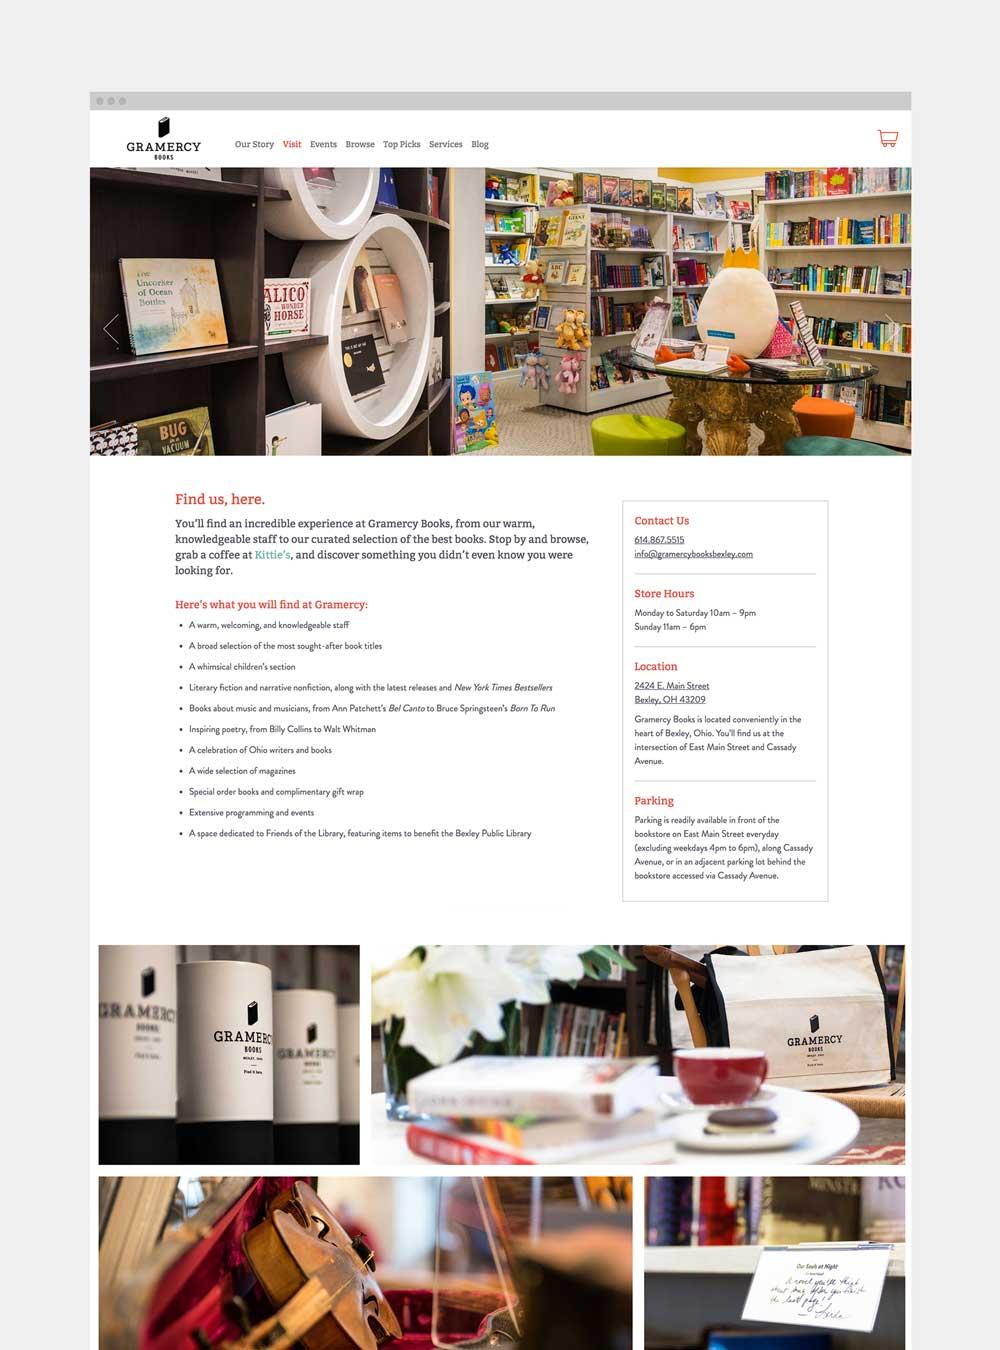 cheers-studios-gramercy-books-bexley-columbus-ohio-website-visit-page-design2.jpg